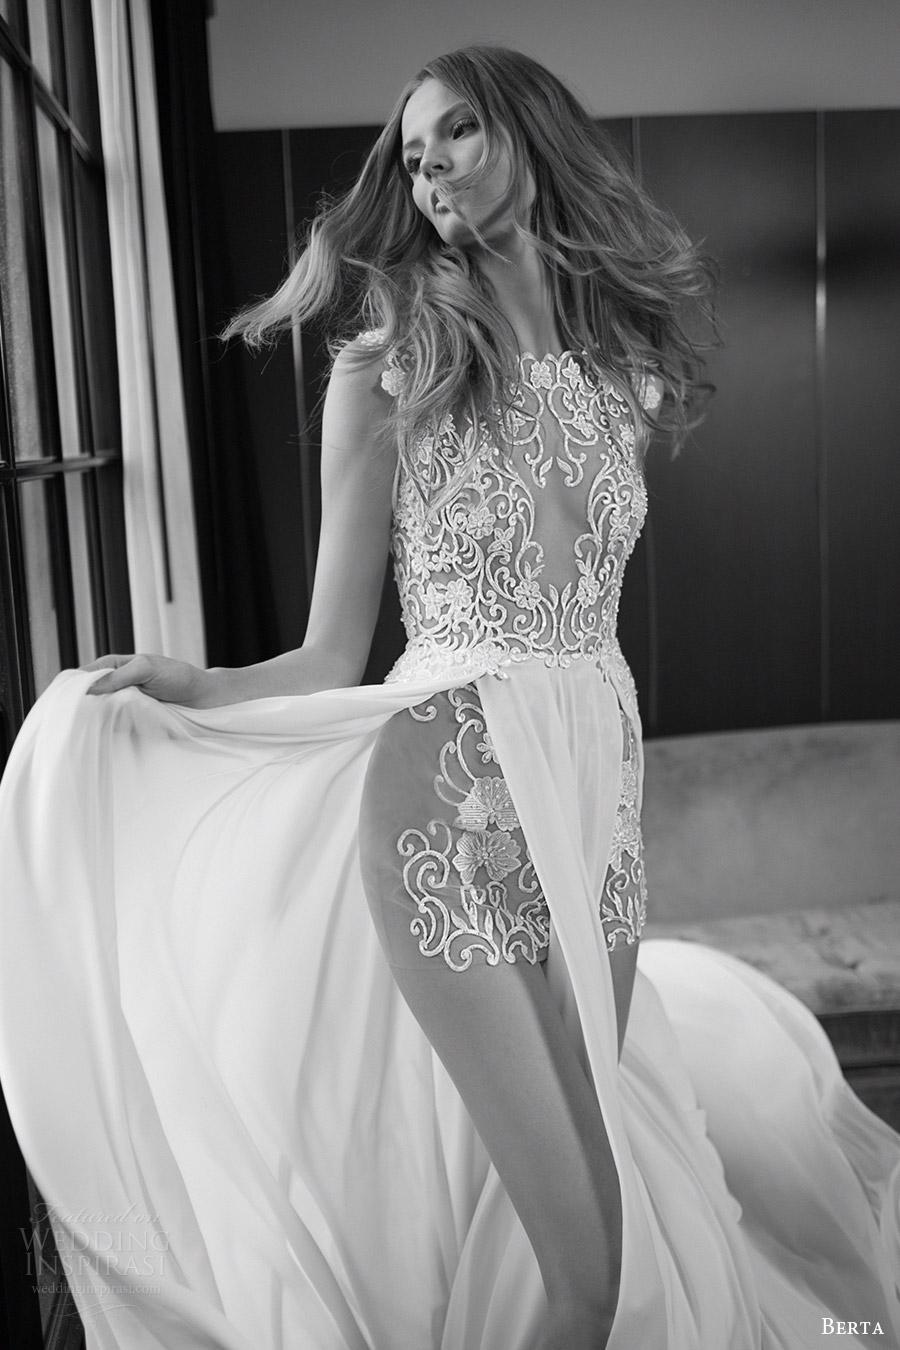 berta bridal fall 2016 sleeveless illusion jewel neck wedding dress aline double slit overskirt (16 106) zv